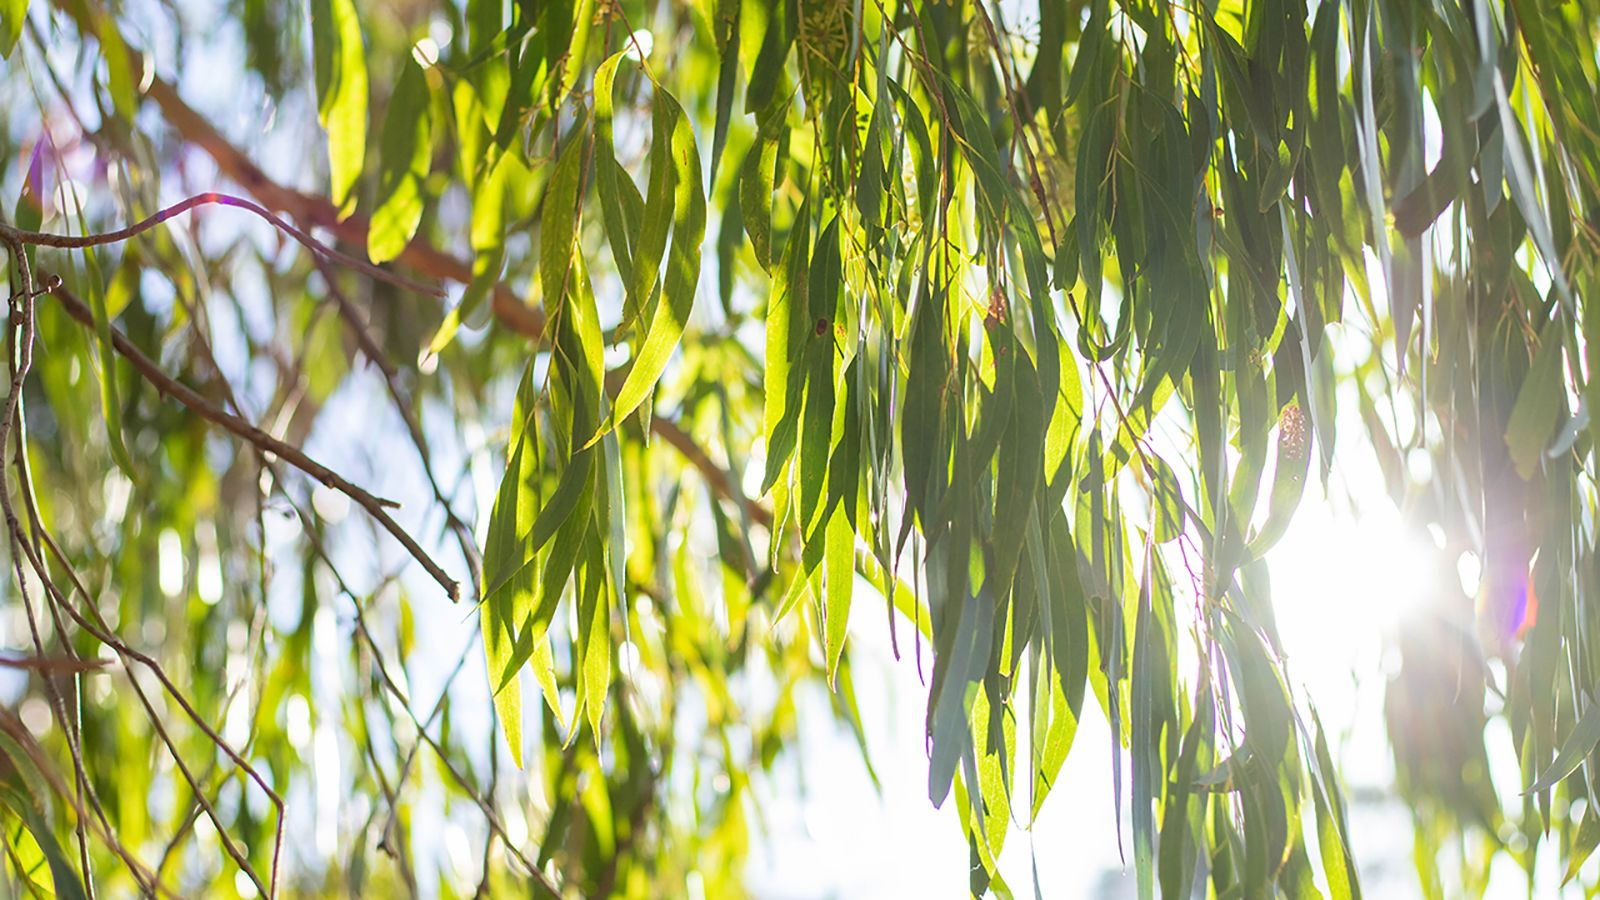 Sunlight shining through green tree leaves. banner image